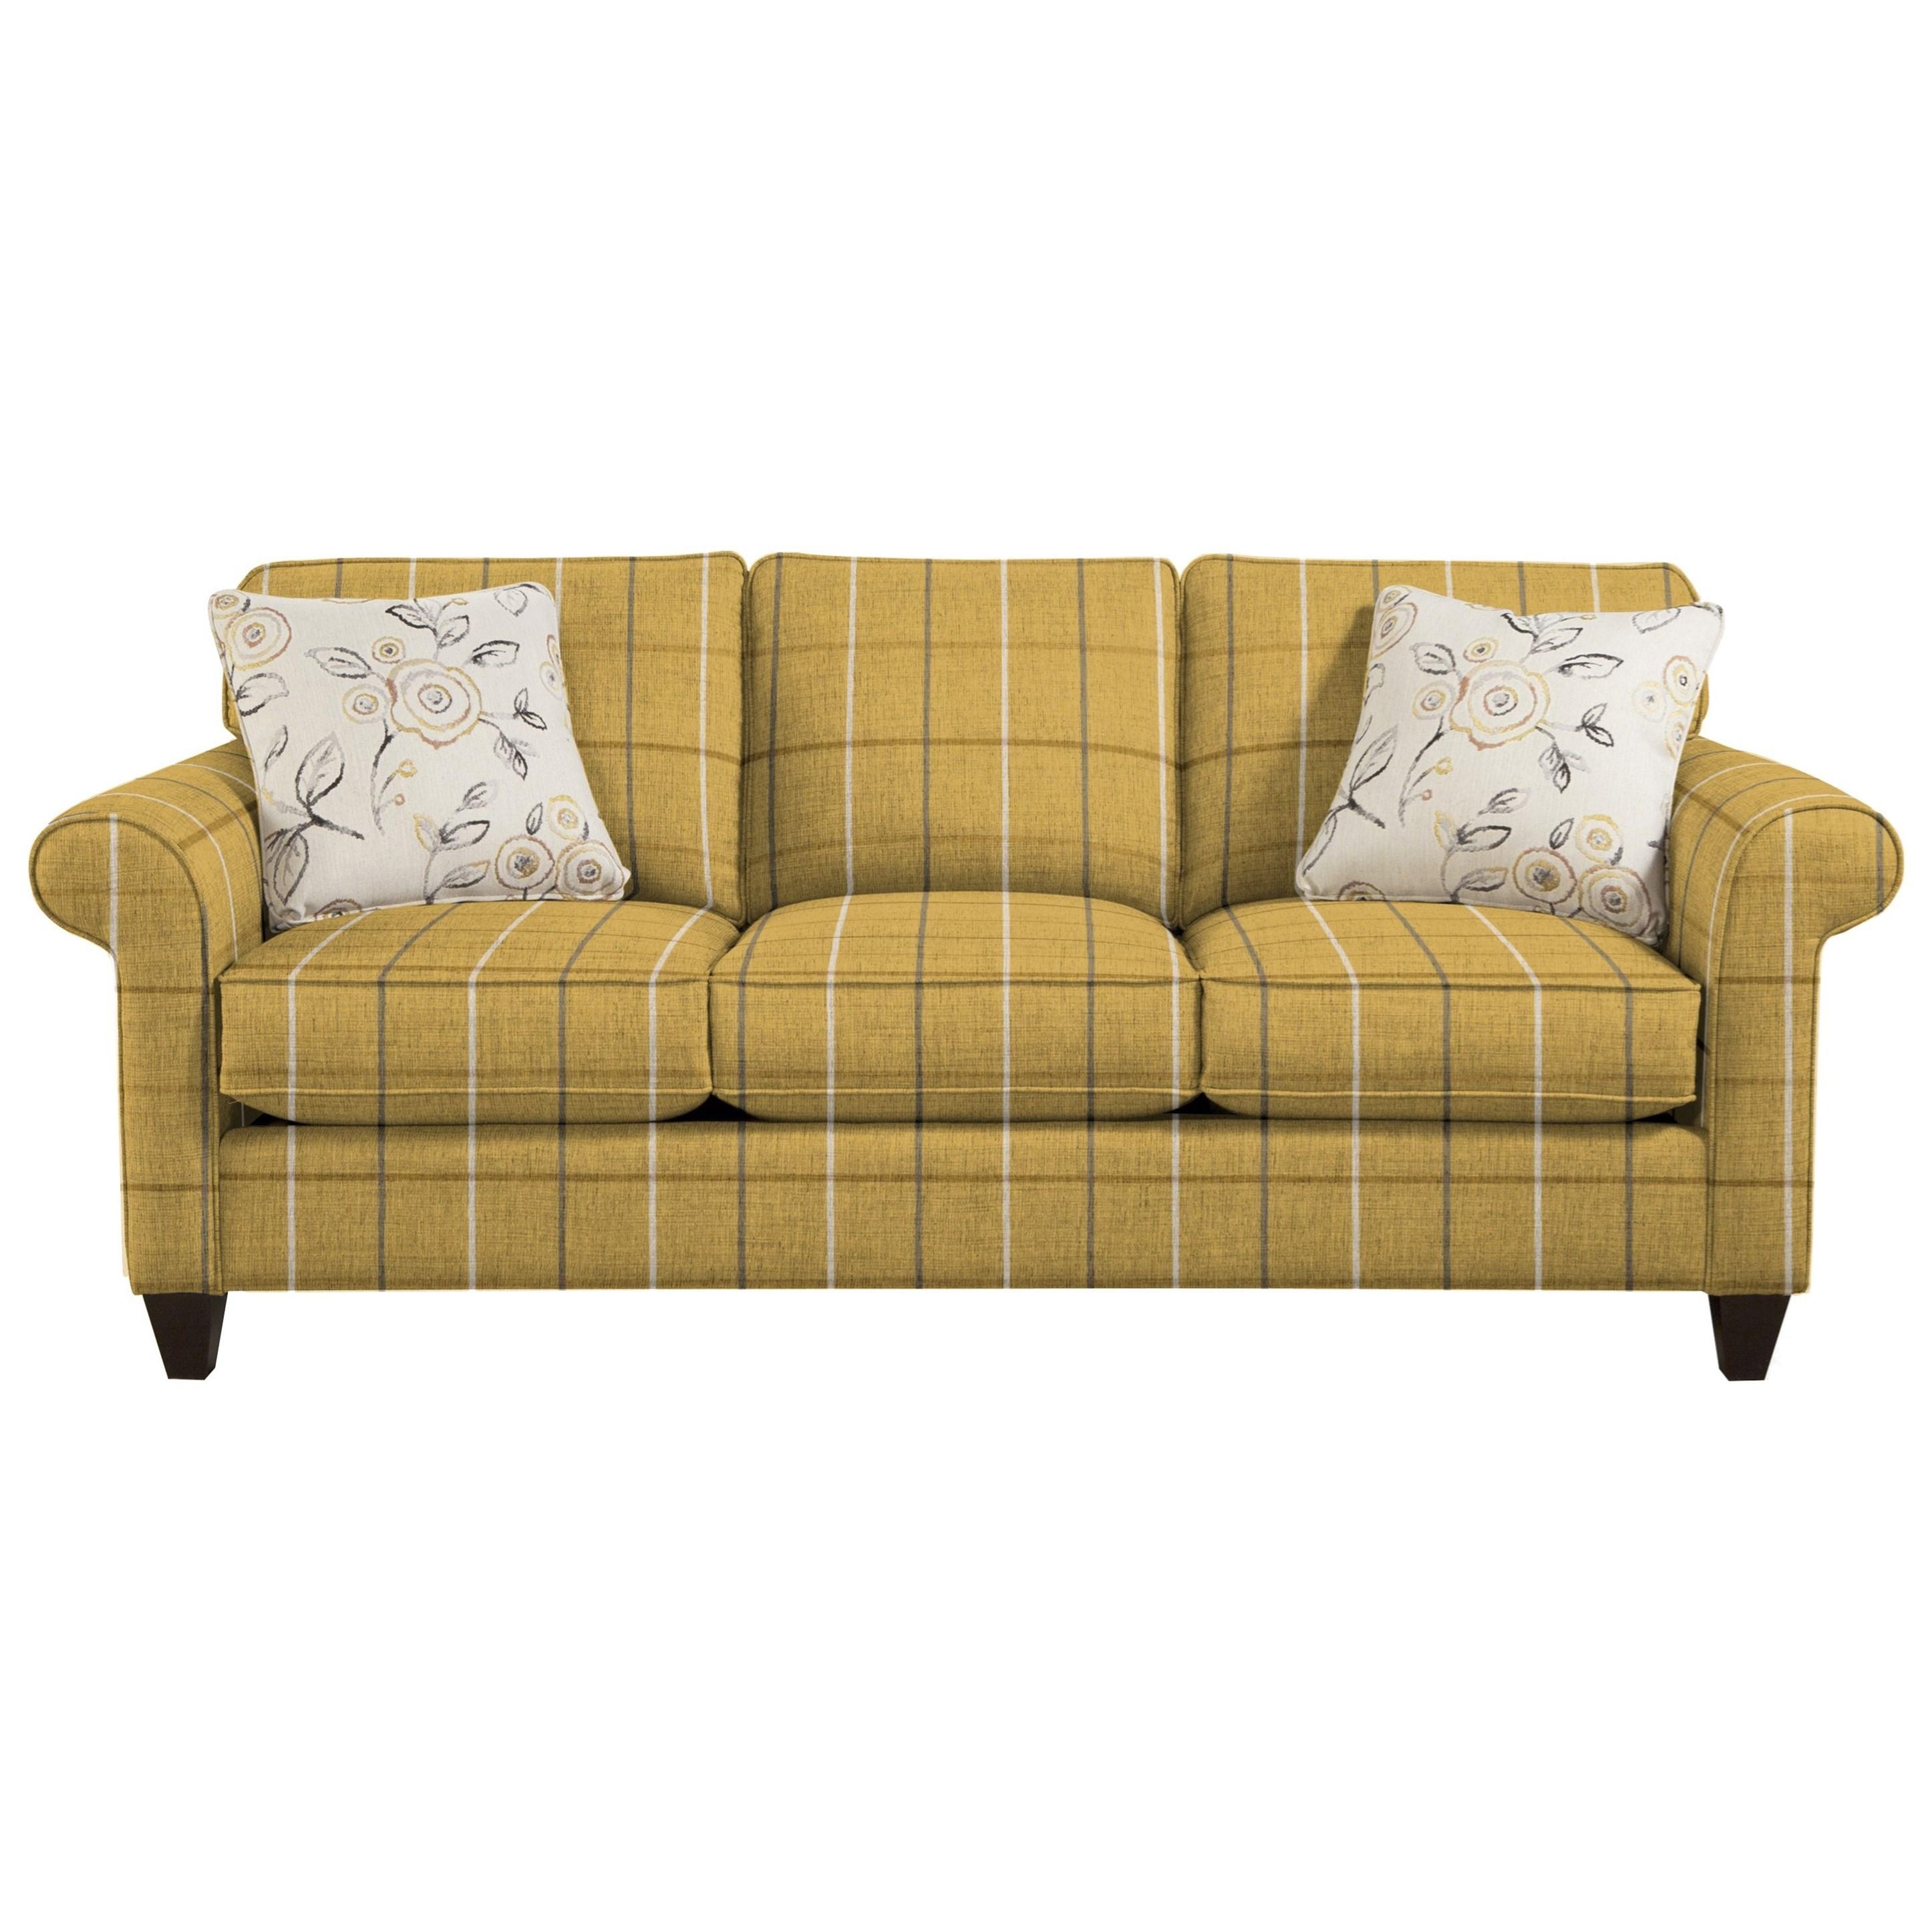 7421 Sofa by Craftmaster at Belfort Furniture